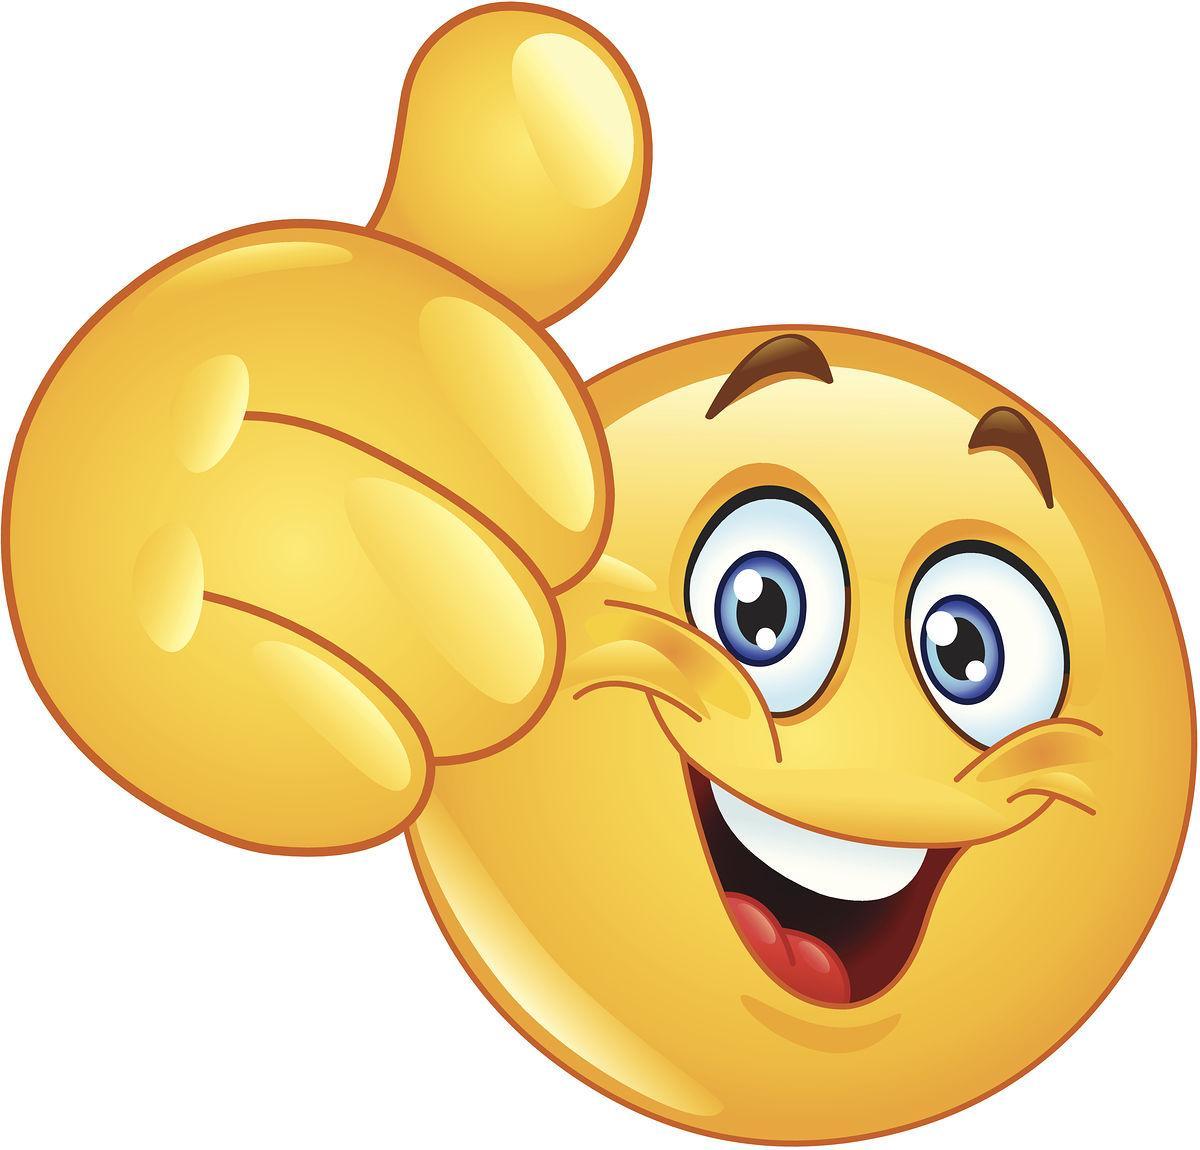 Calm clipart emoji. Emojis get a big